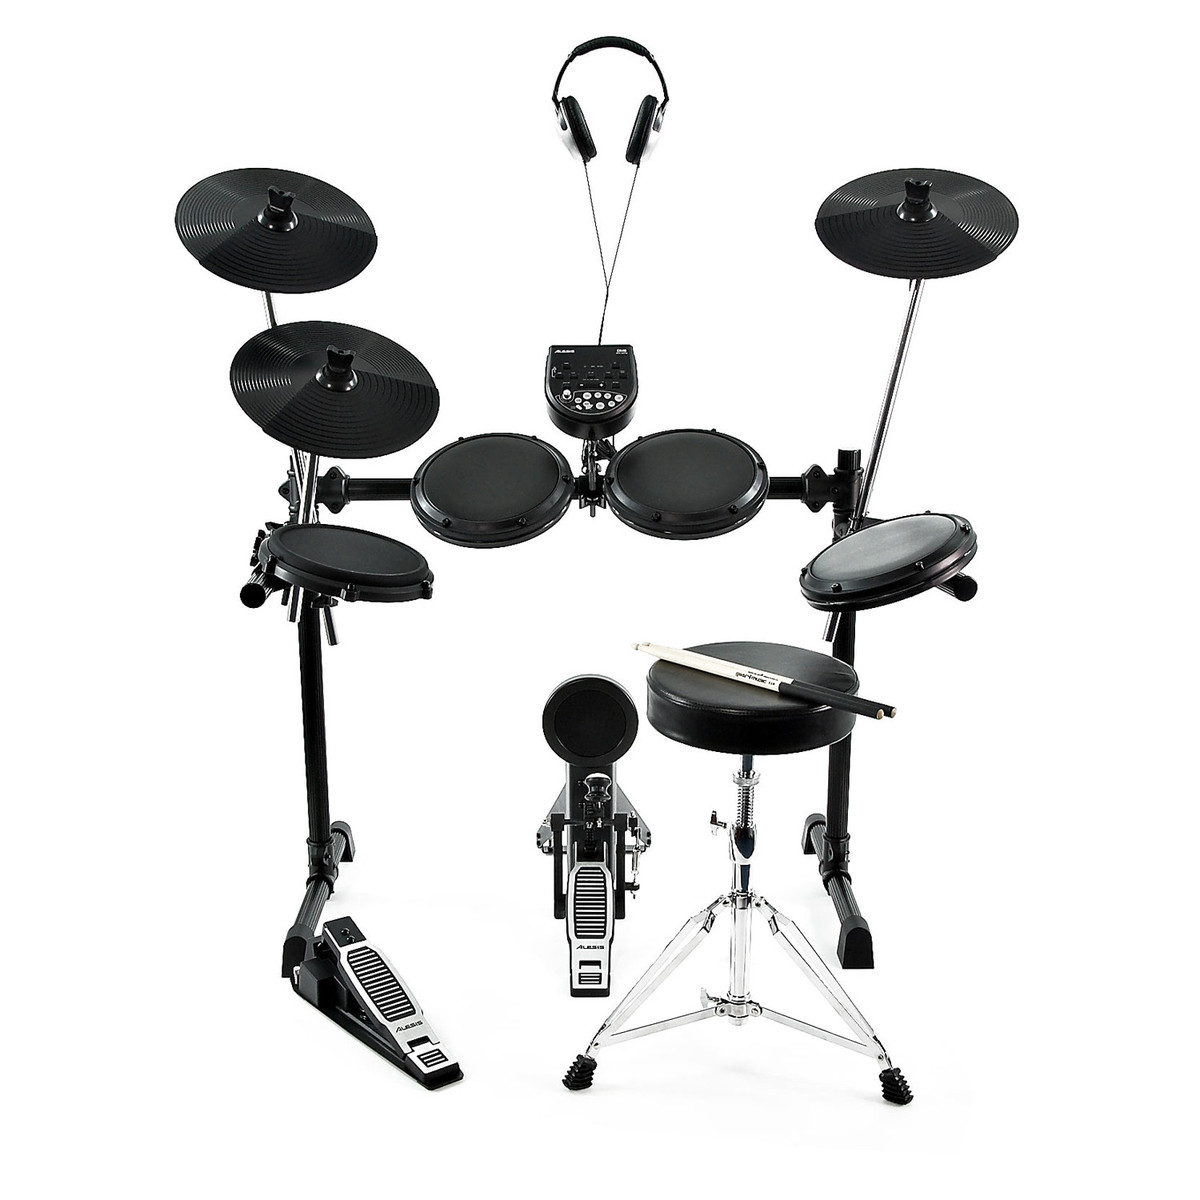 disc alesis dm6 usb electronic drum kit stool headphones sticks at gear4music. Black Bedroom Furniture Sets. Home Design Ideas